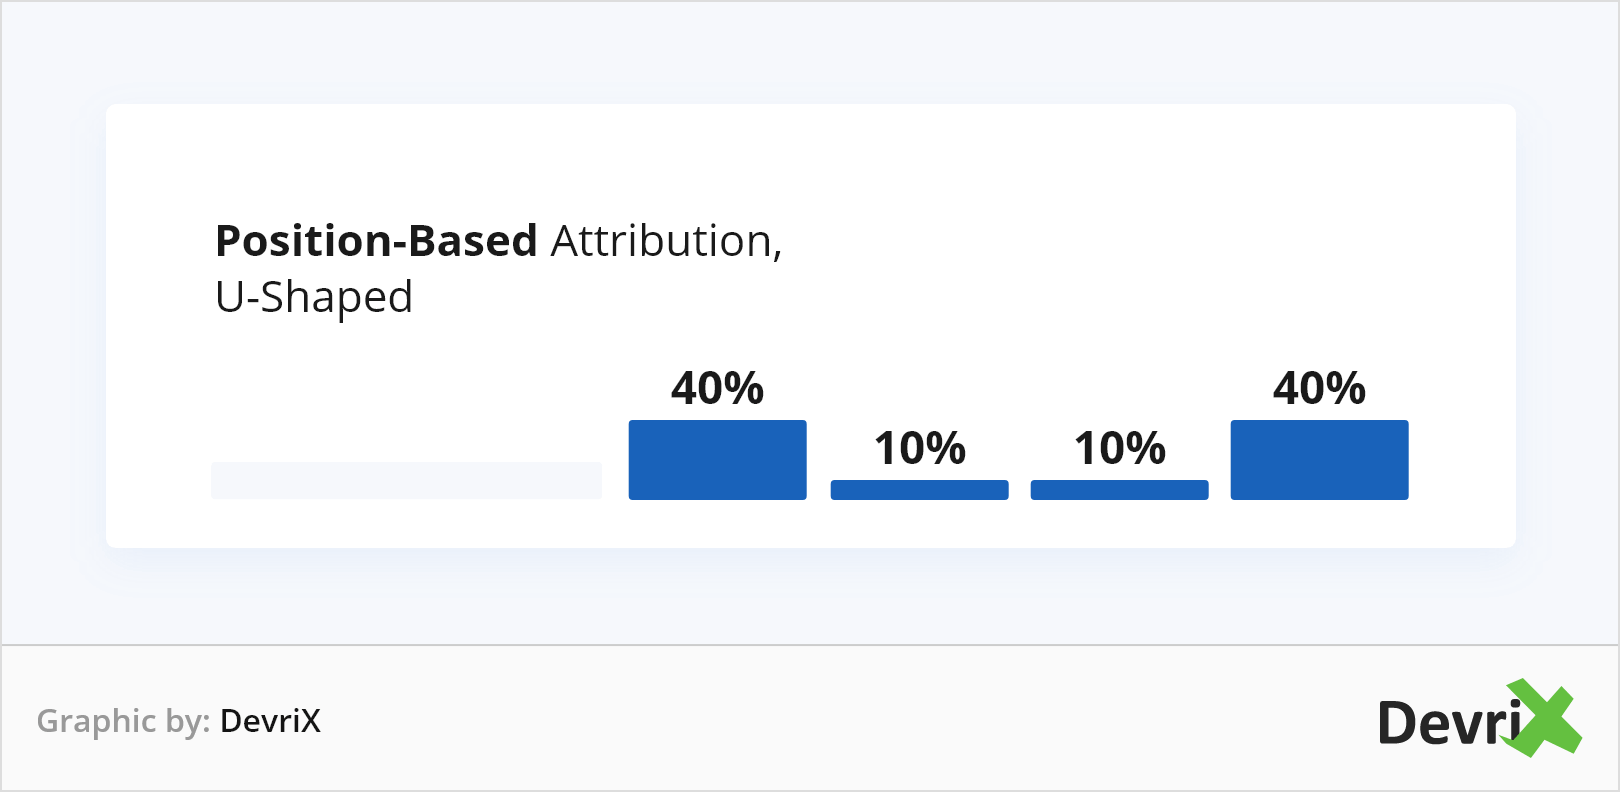 Position-Based Attribution U-Shaped